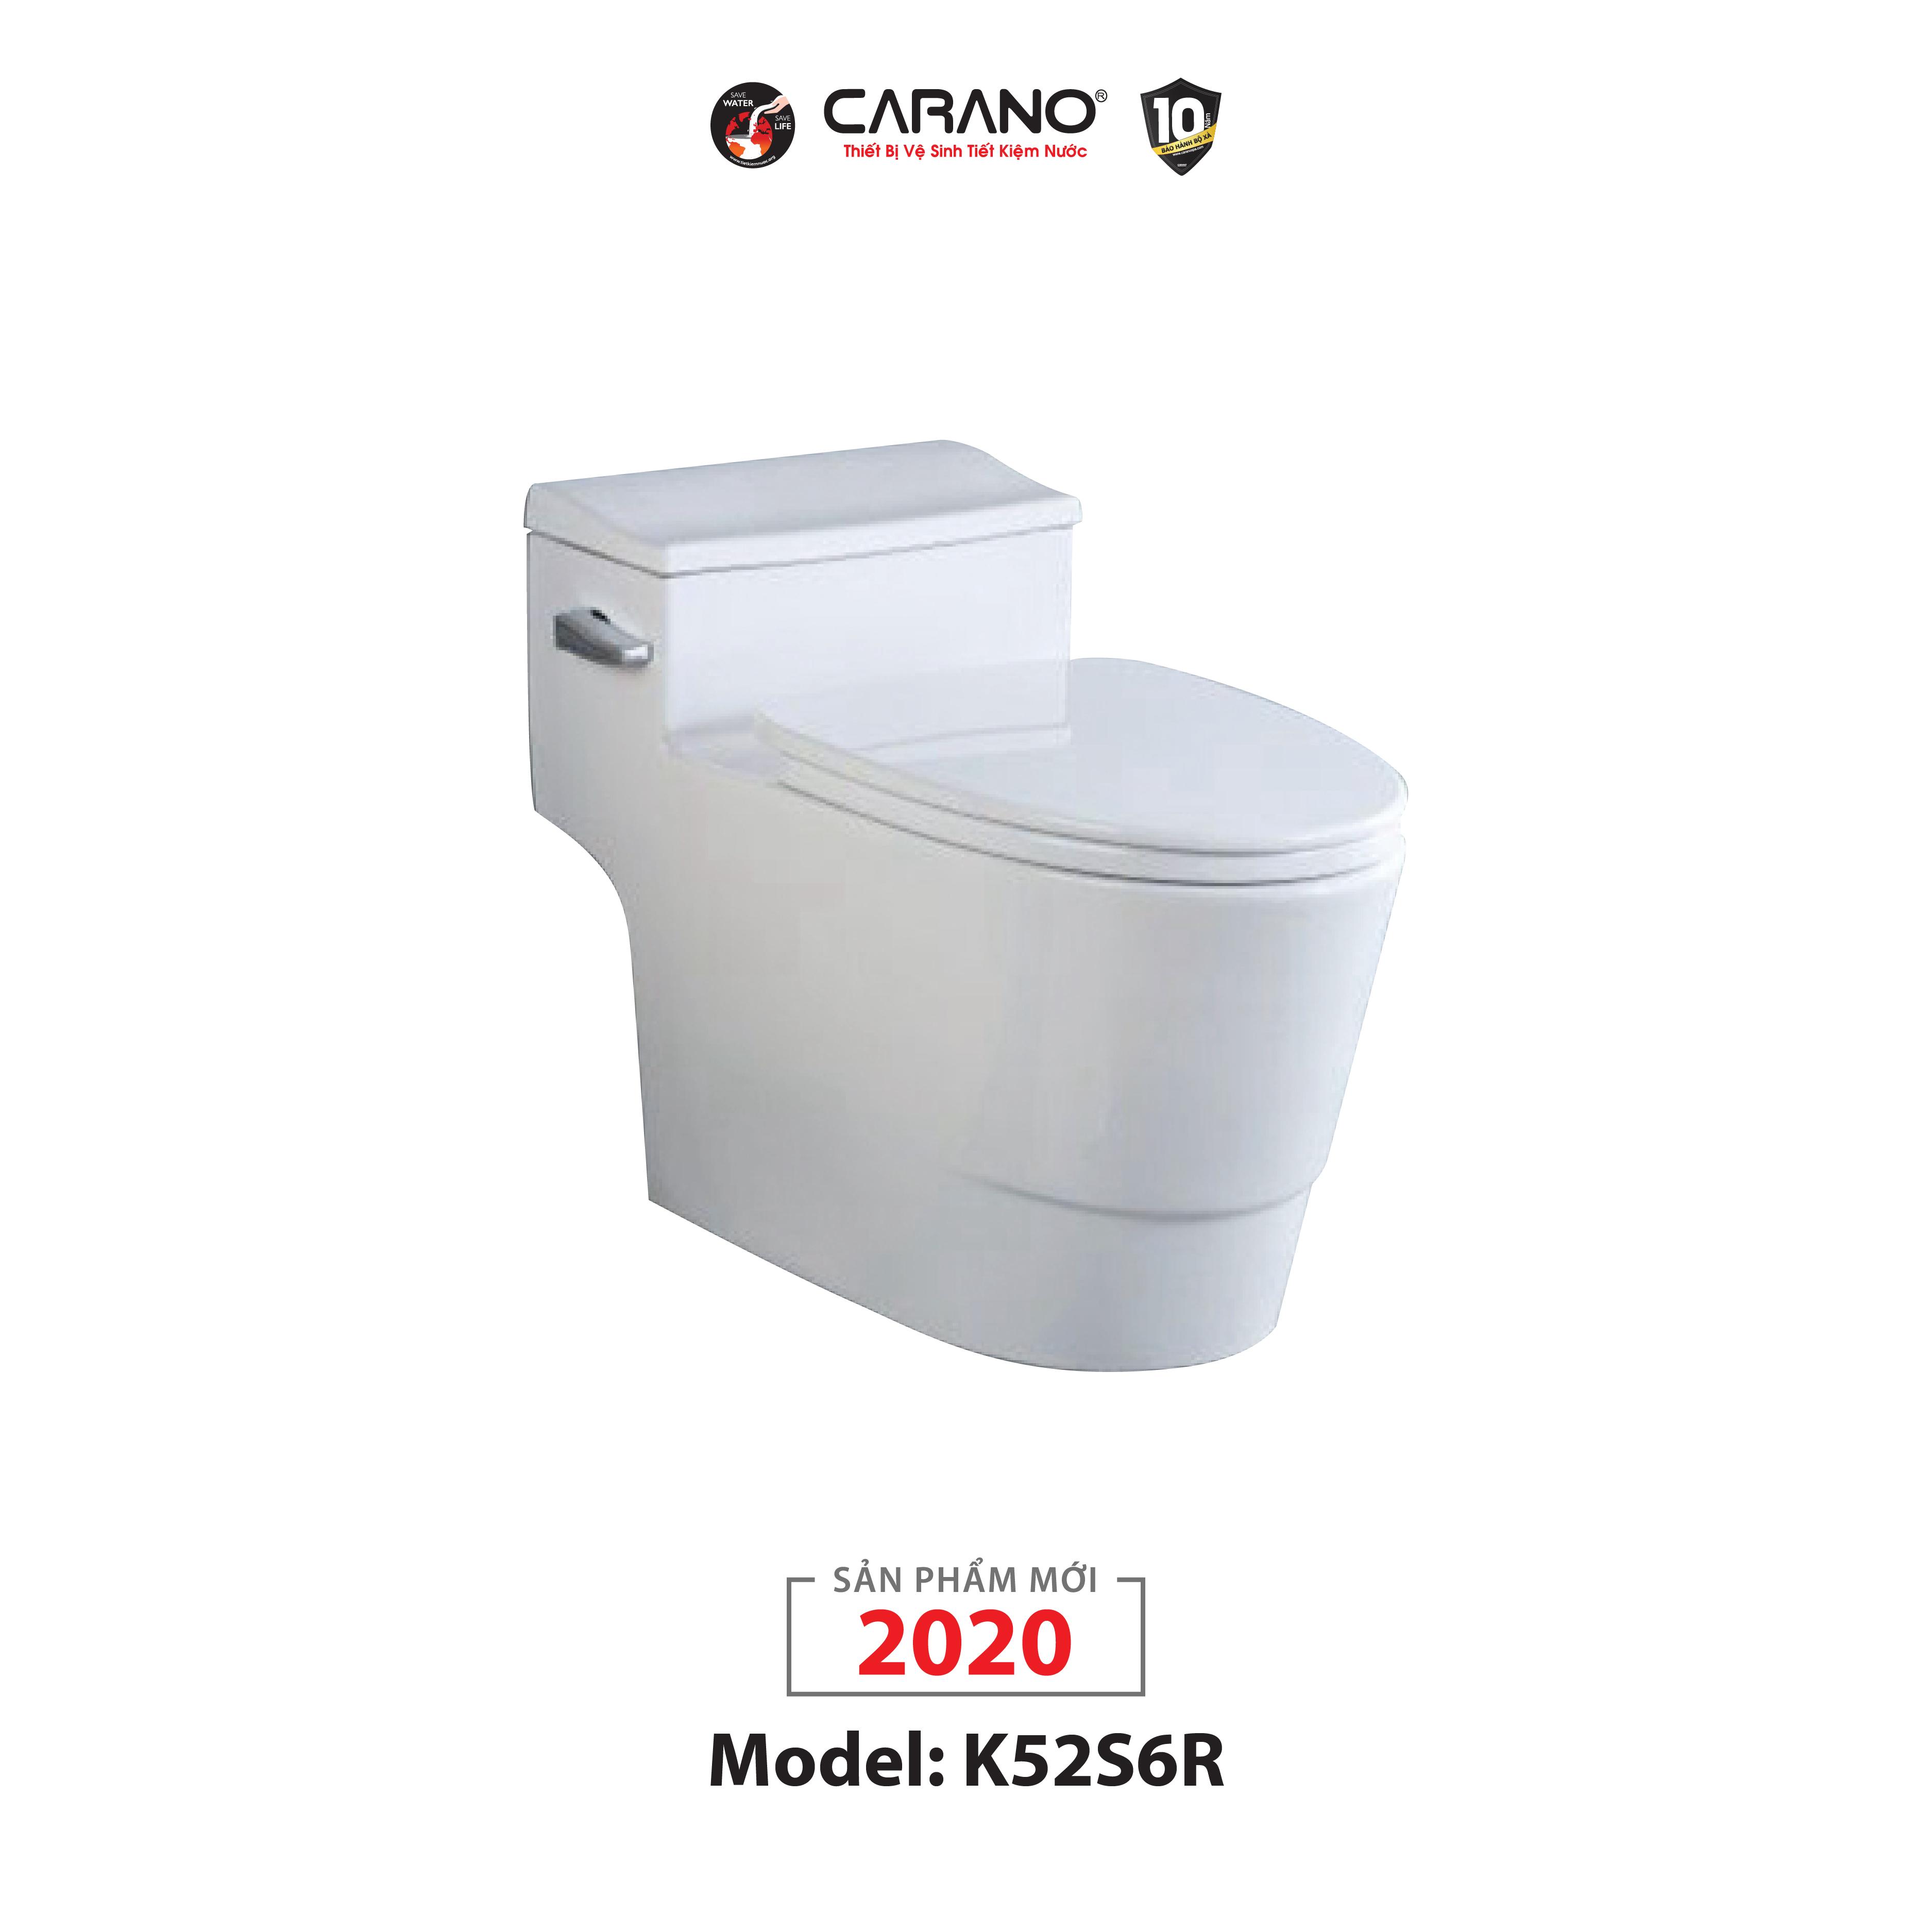 BỒN CẦU CARANO 1 KHỐI K52S6R (TOILET MODEL: K52S6R)